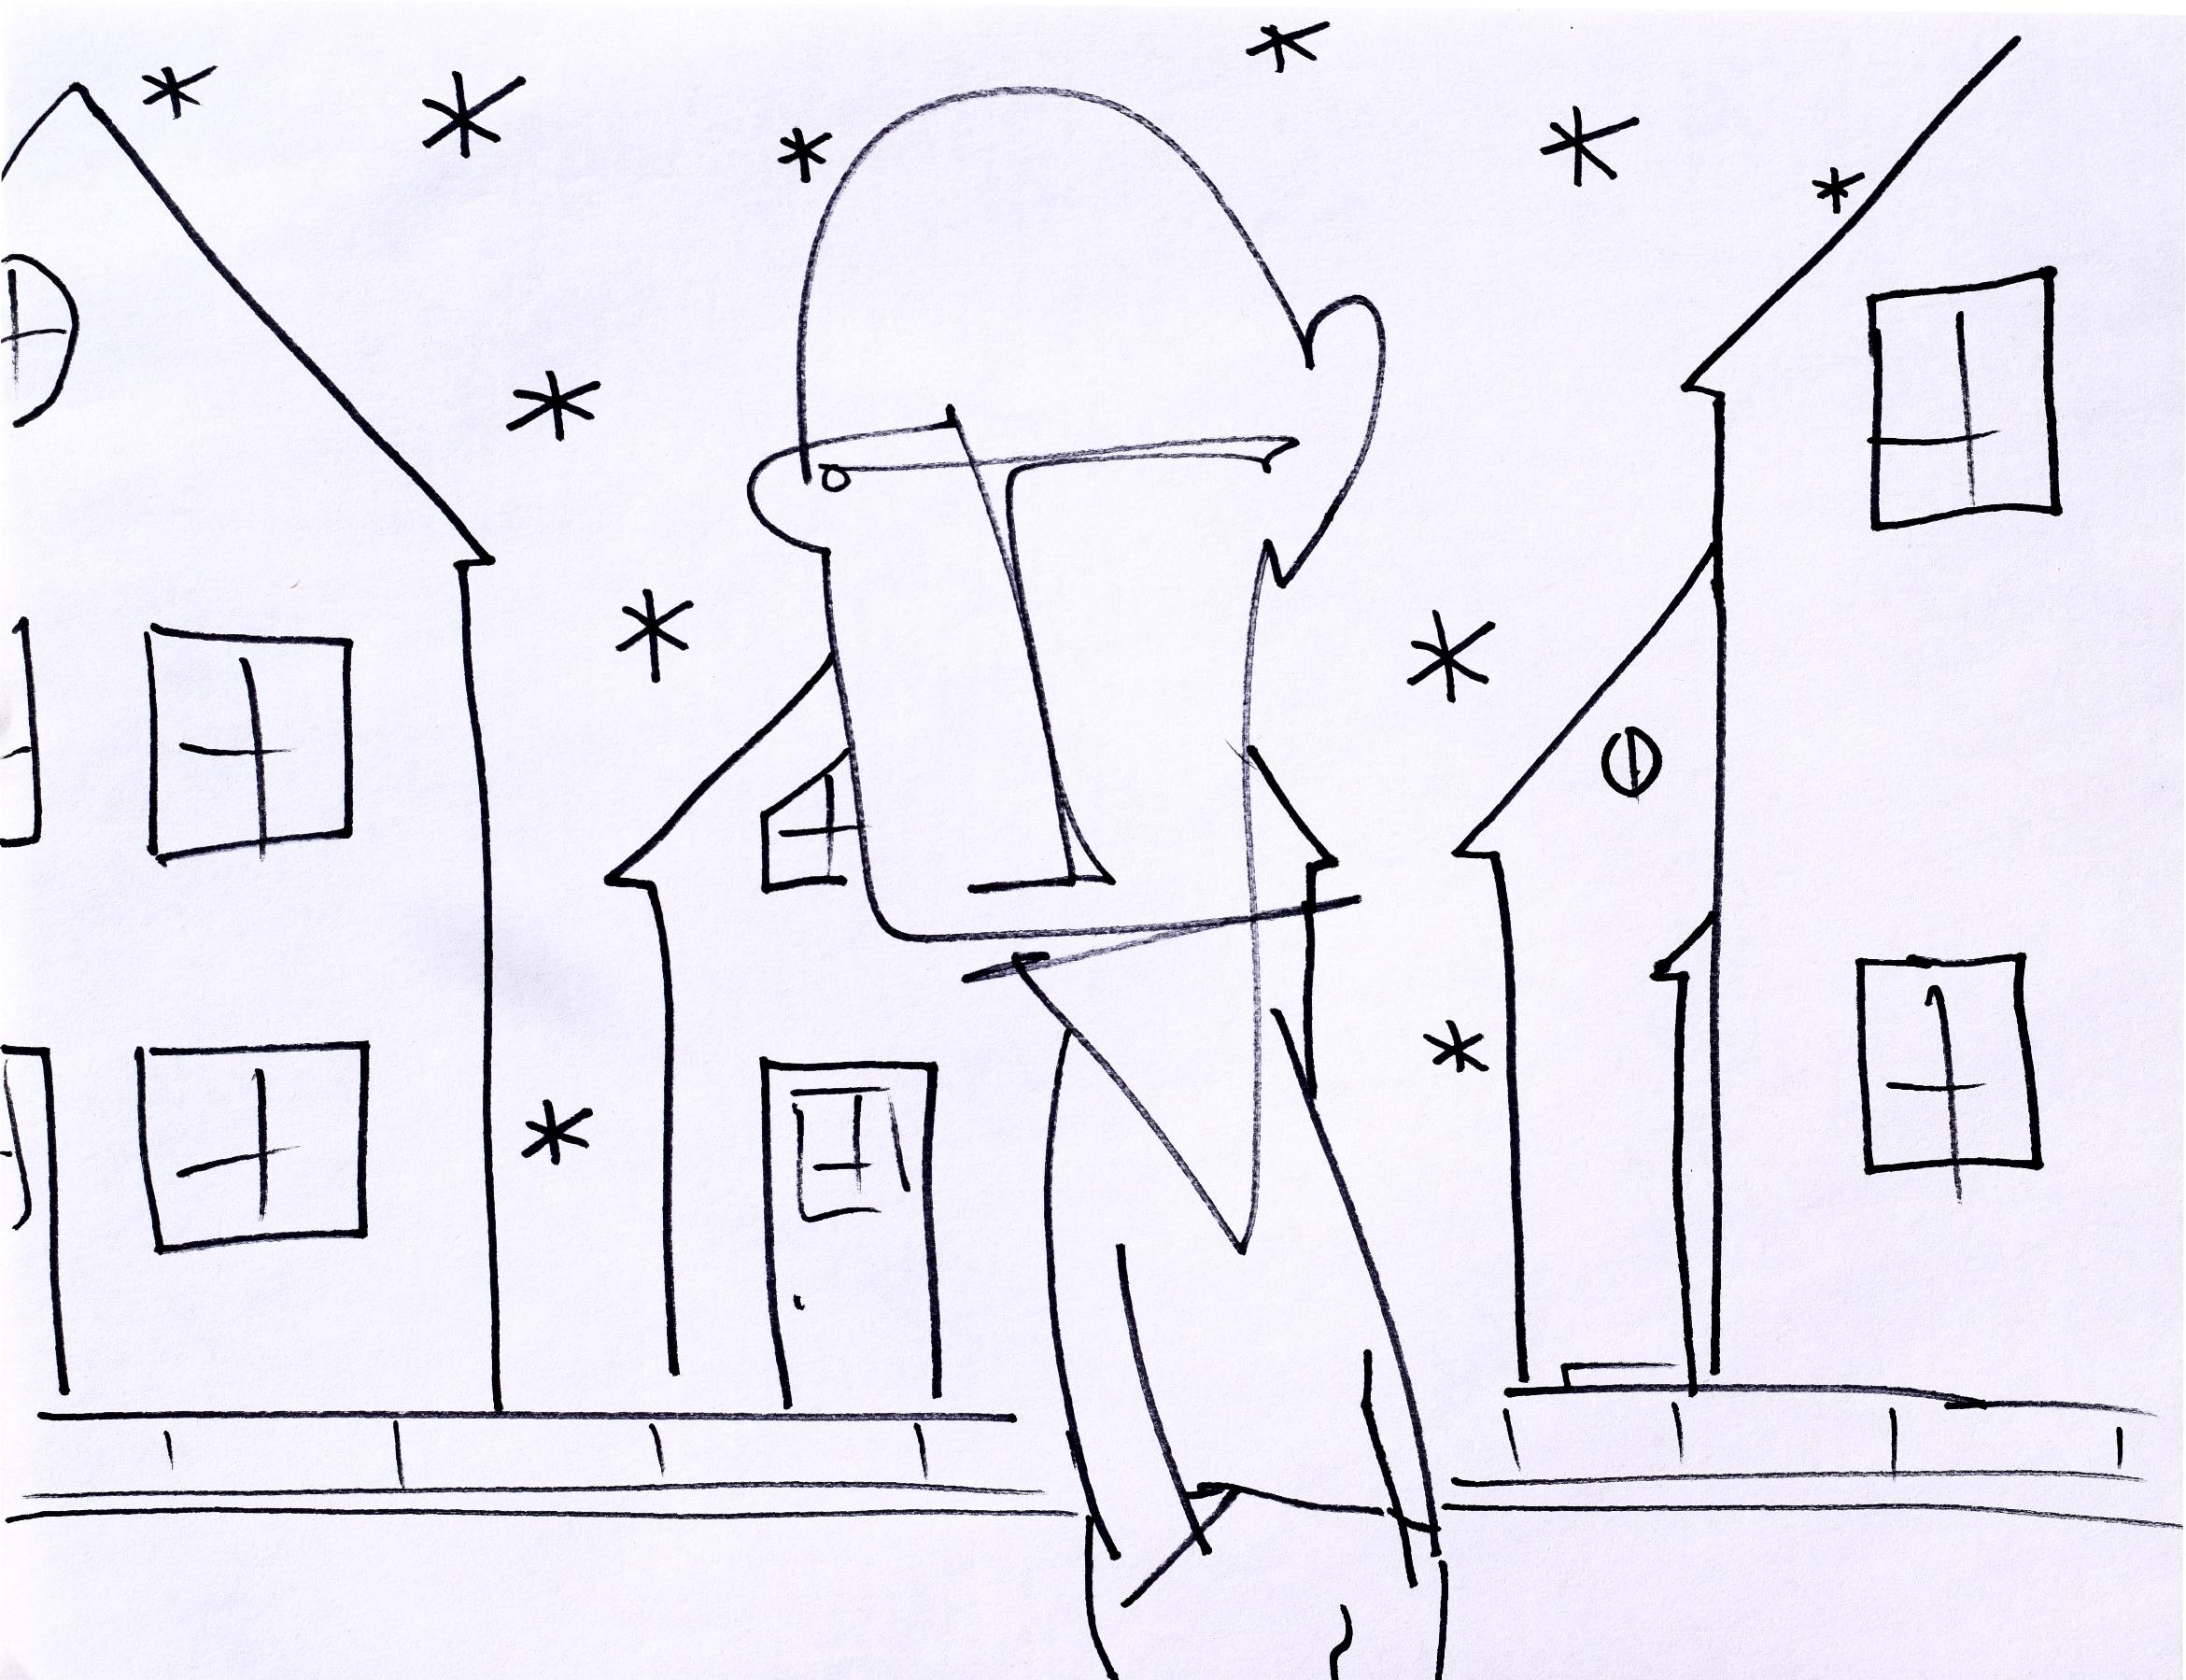 will gebhard drawing walking at night-01.jpg